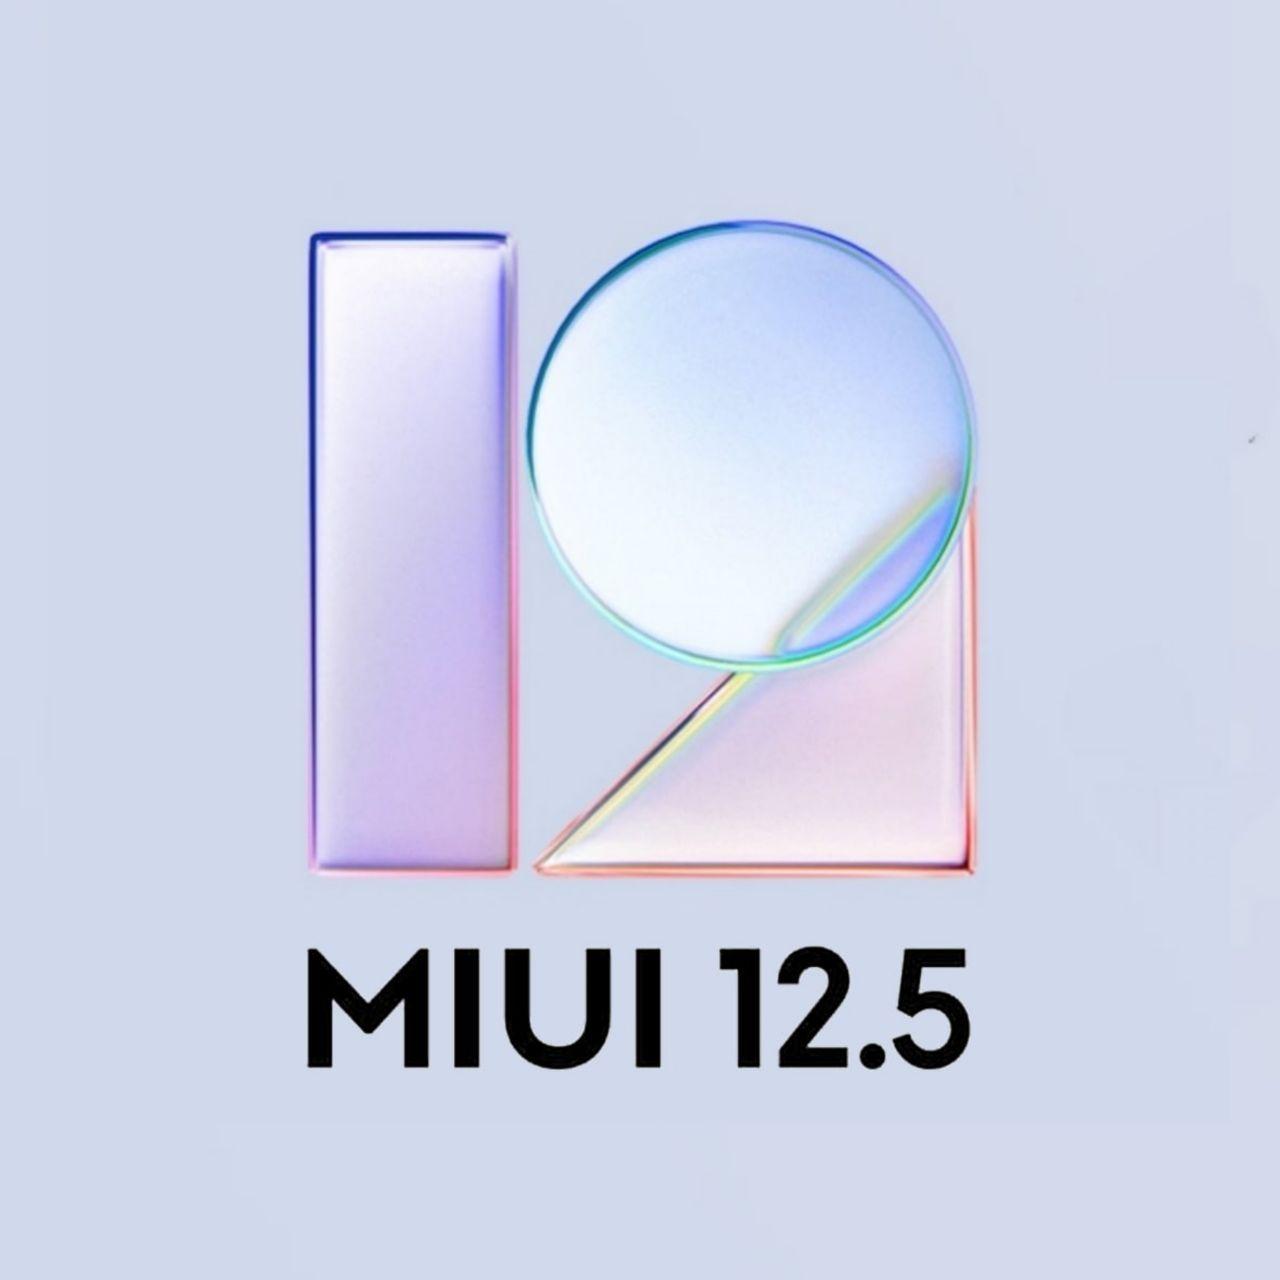 رابطکاربری MIUI 12.5